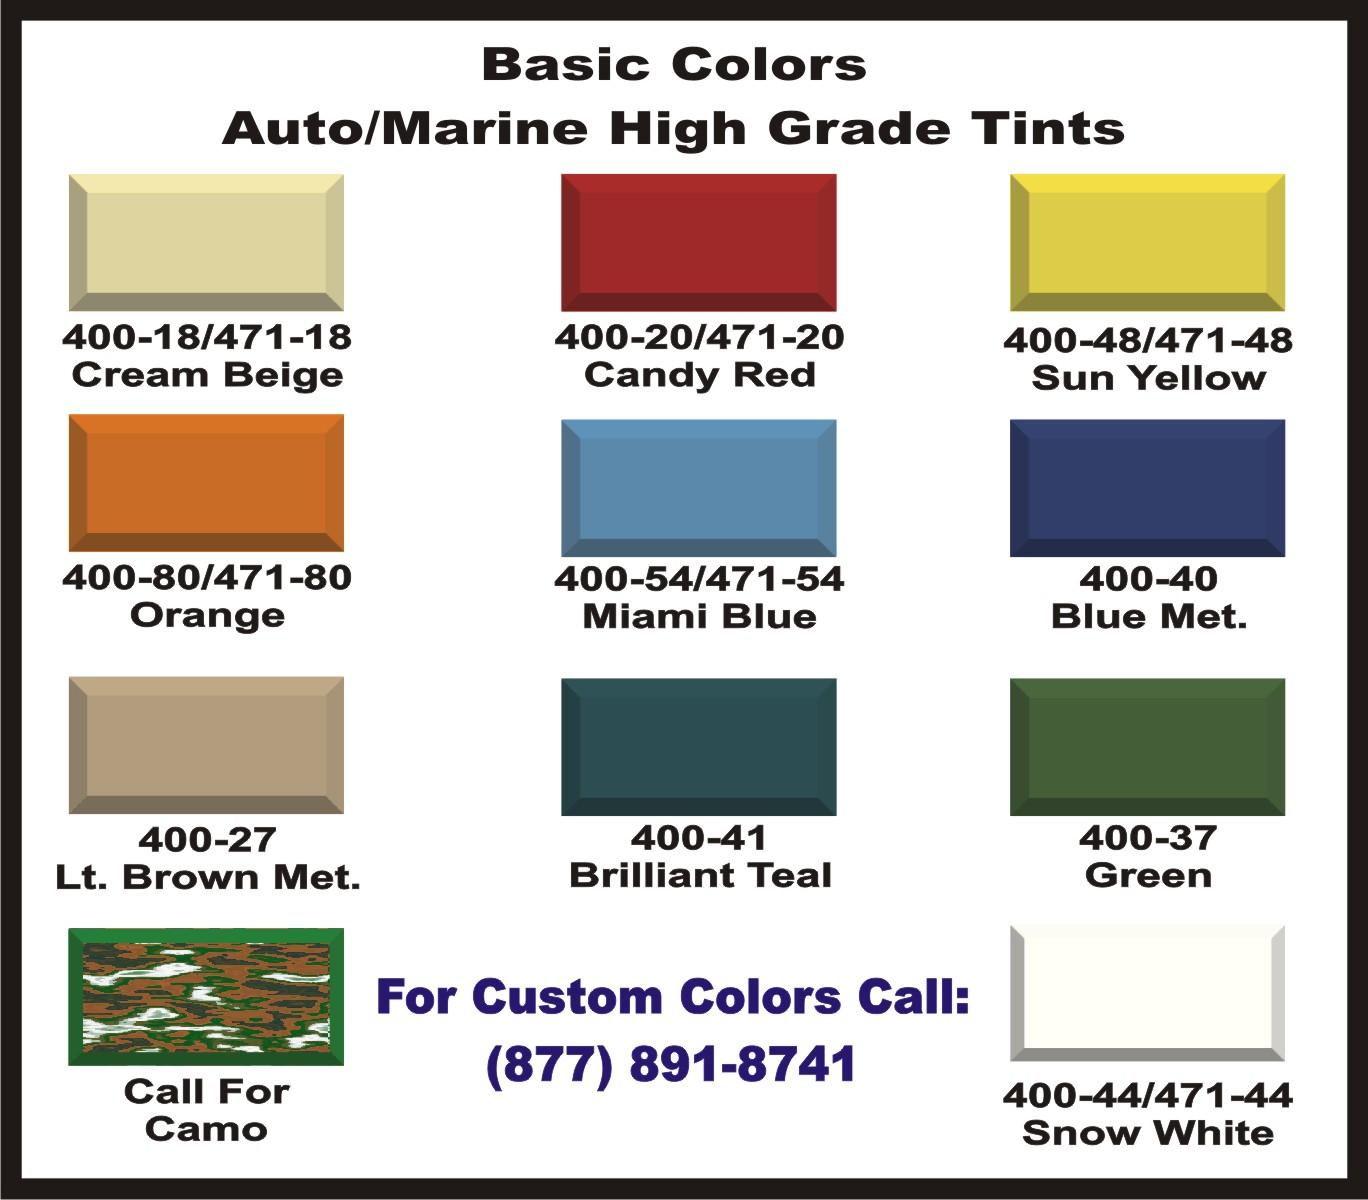 Colored Bed Liner Spray : Rhino liner colors images raptor spray in bedliner